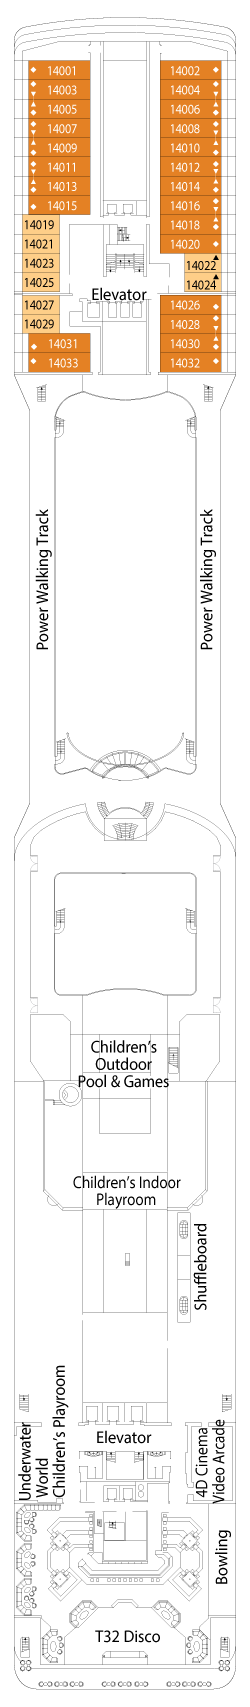 MSC Magnifica Deck 14